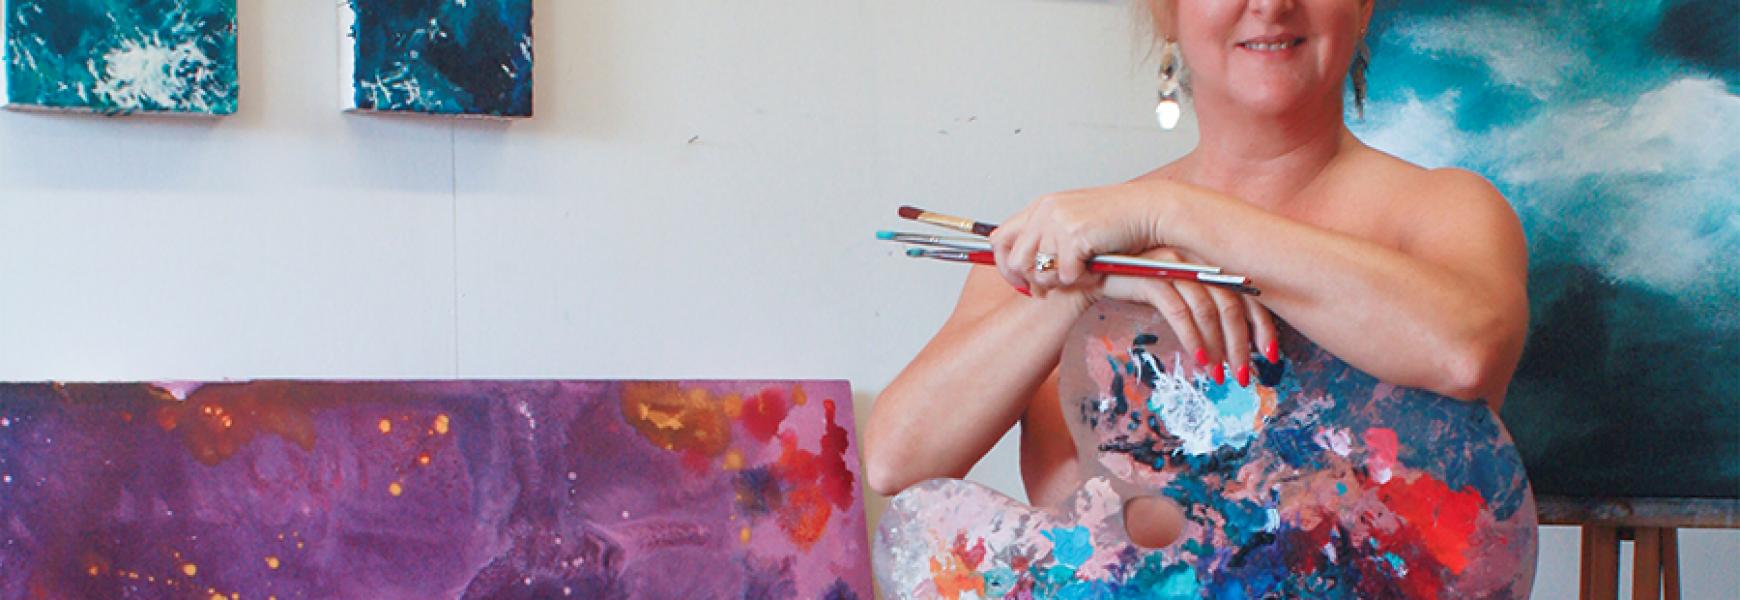 Cherie Lidbury Artist & Naturist